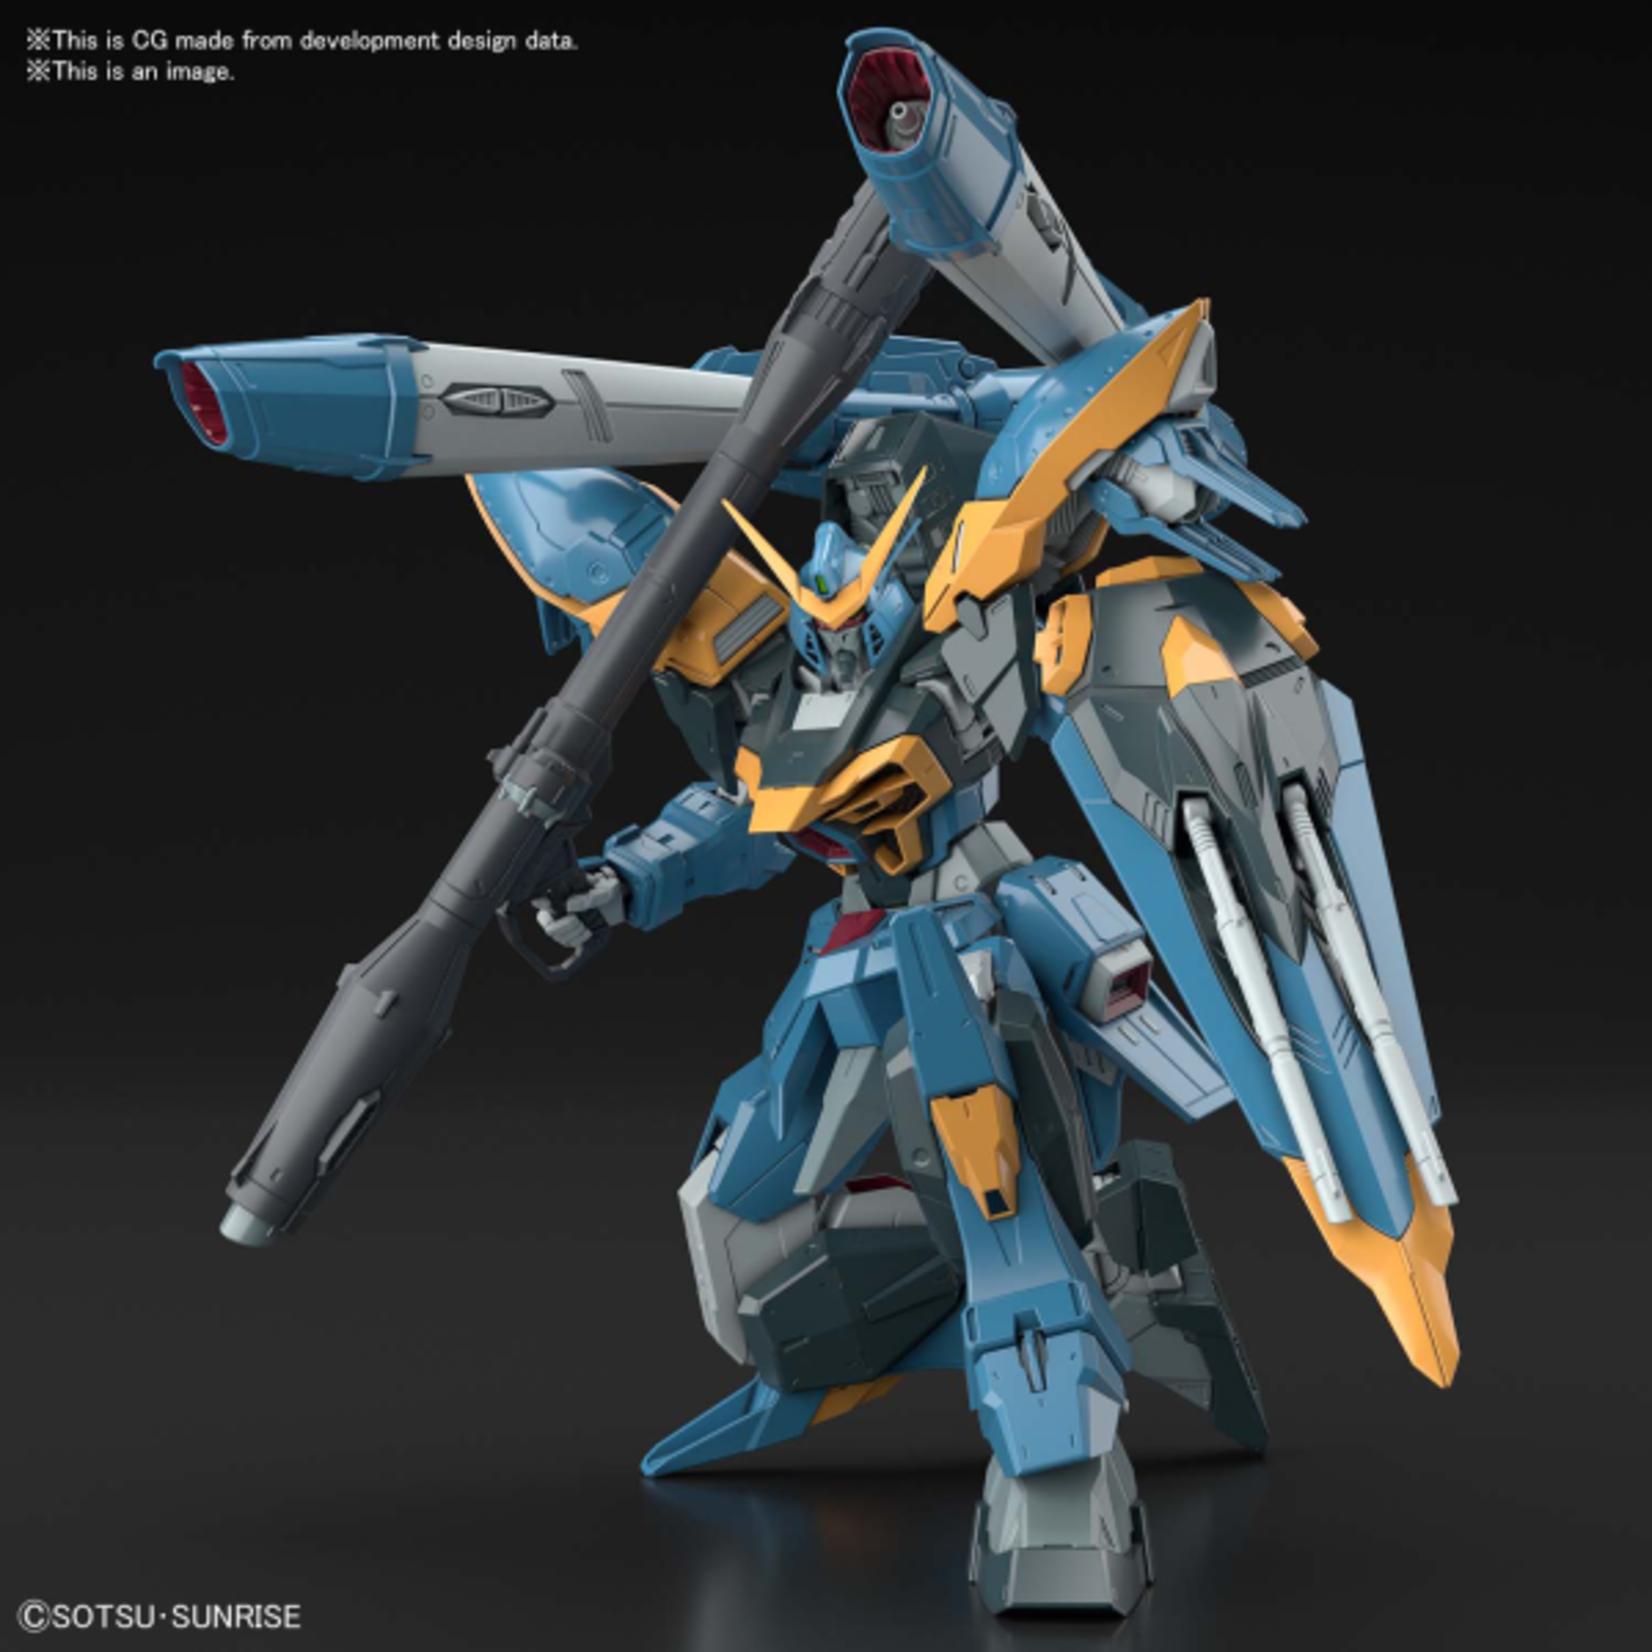 Bandai Full Mechanics - GAT-X131 Calamity Gundam (1/100)